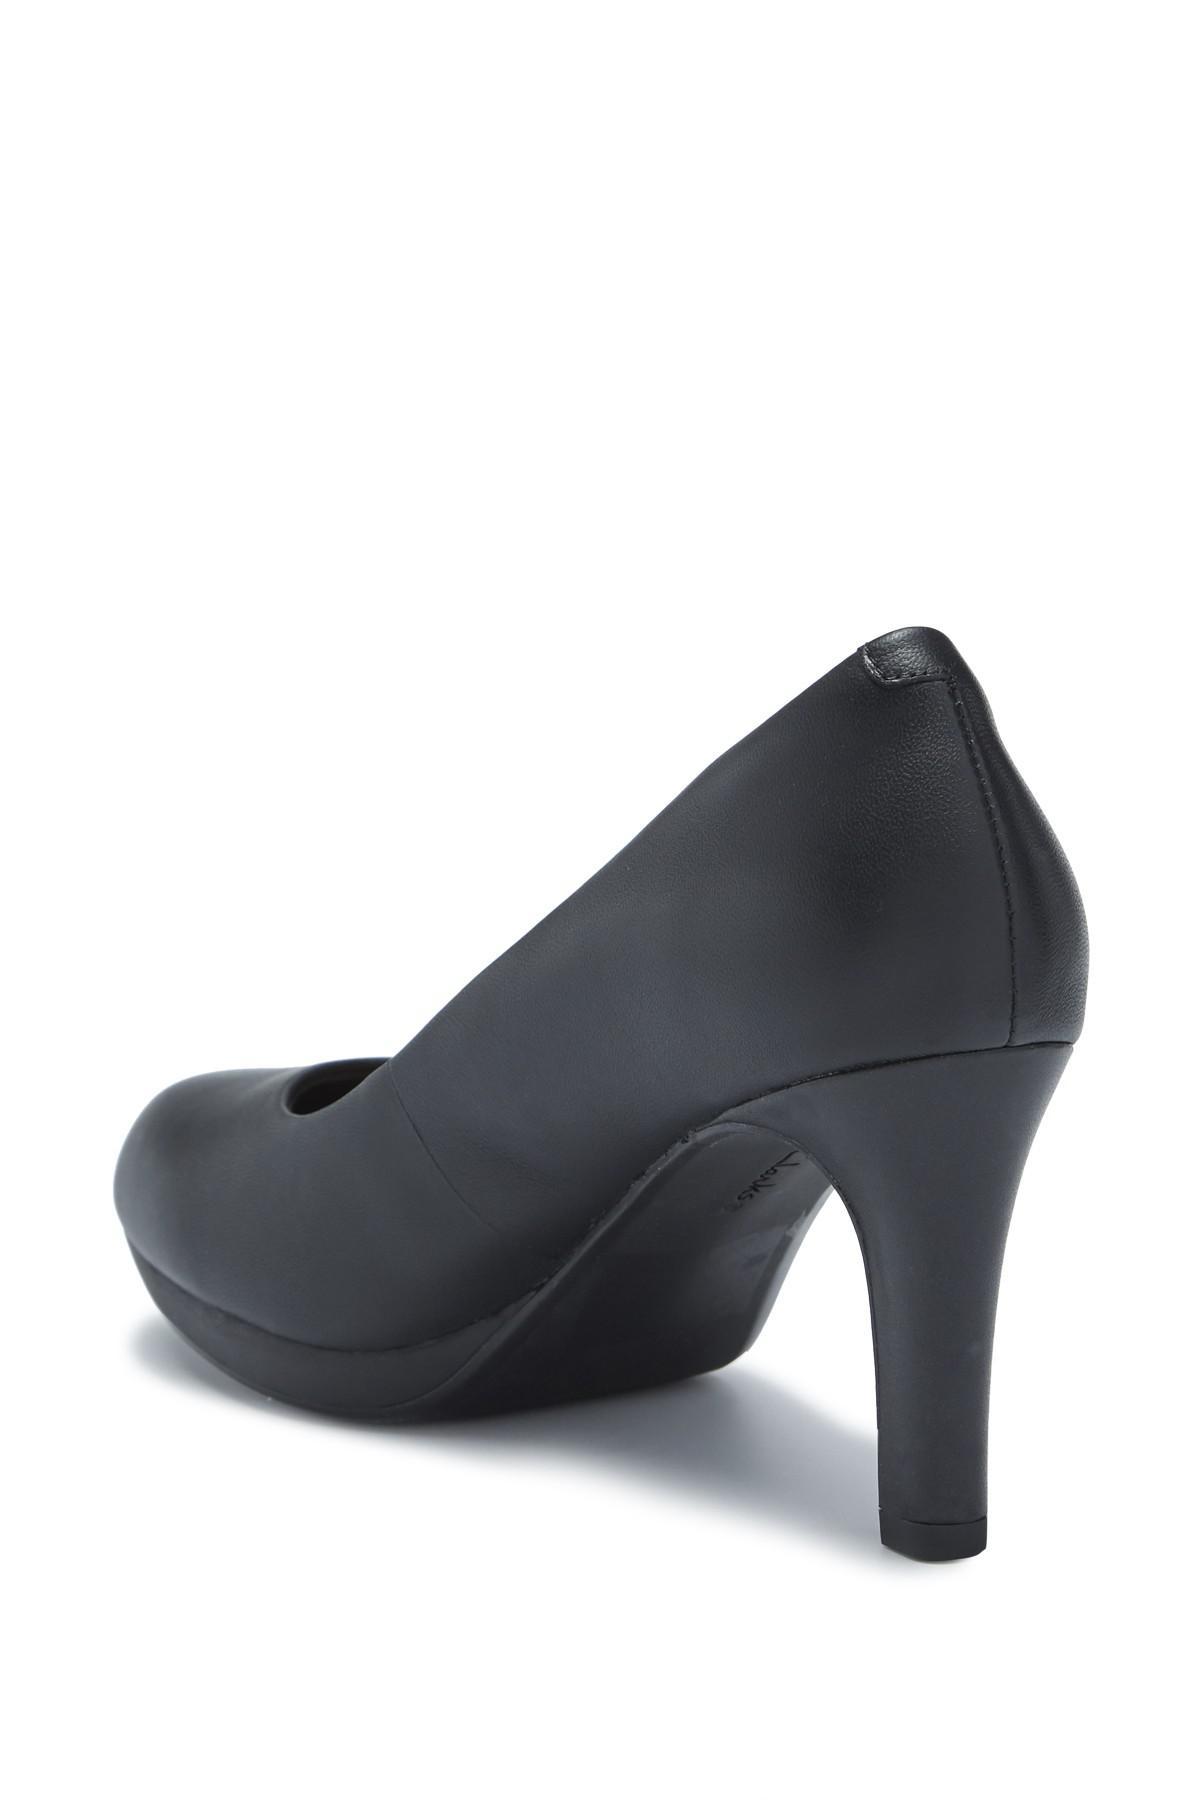 642a1dc4b39 Clarks - Black Adriel Viola Leather Pump - Wide Width Available - Lyst.  View fullscreen